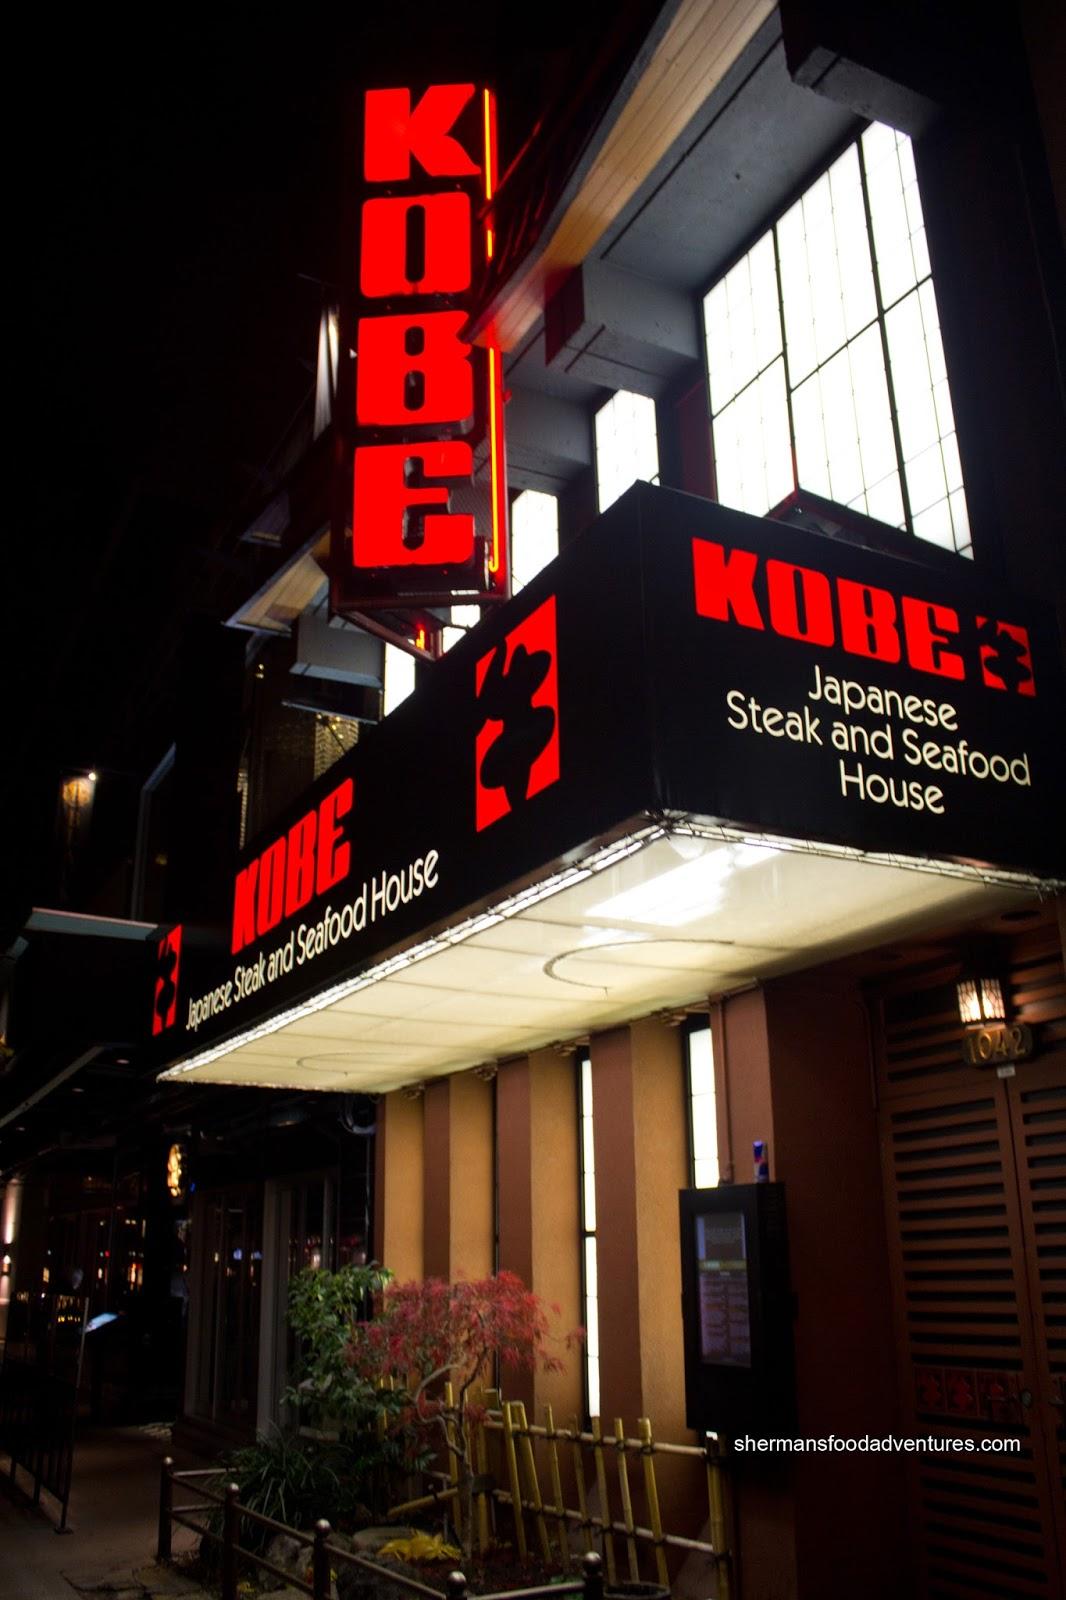 Sherman's Food Adventures: Kobe Izakaya Lounge